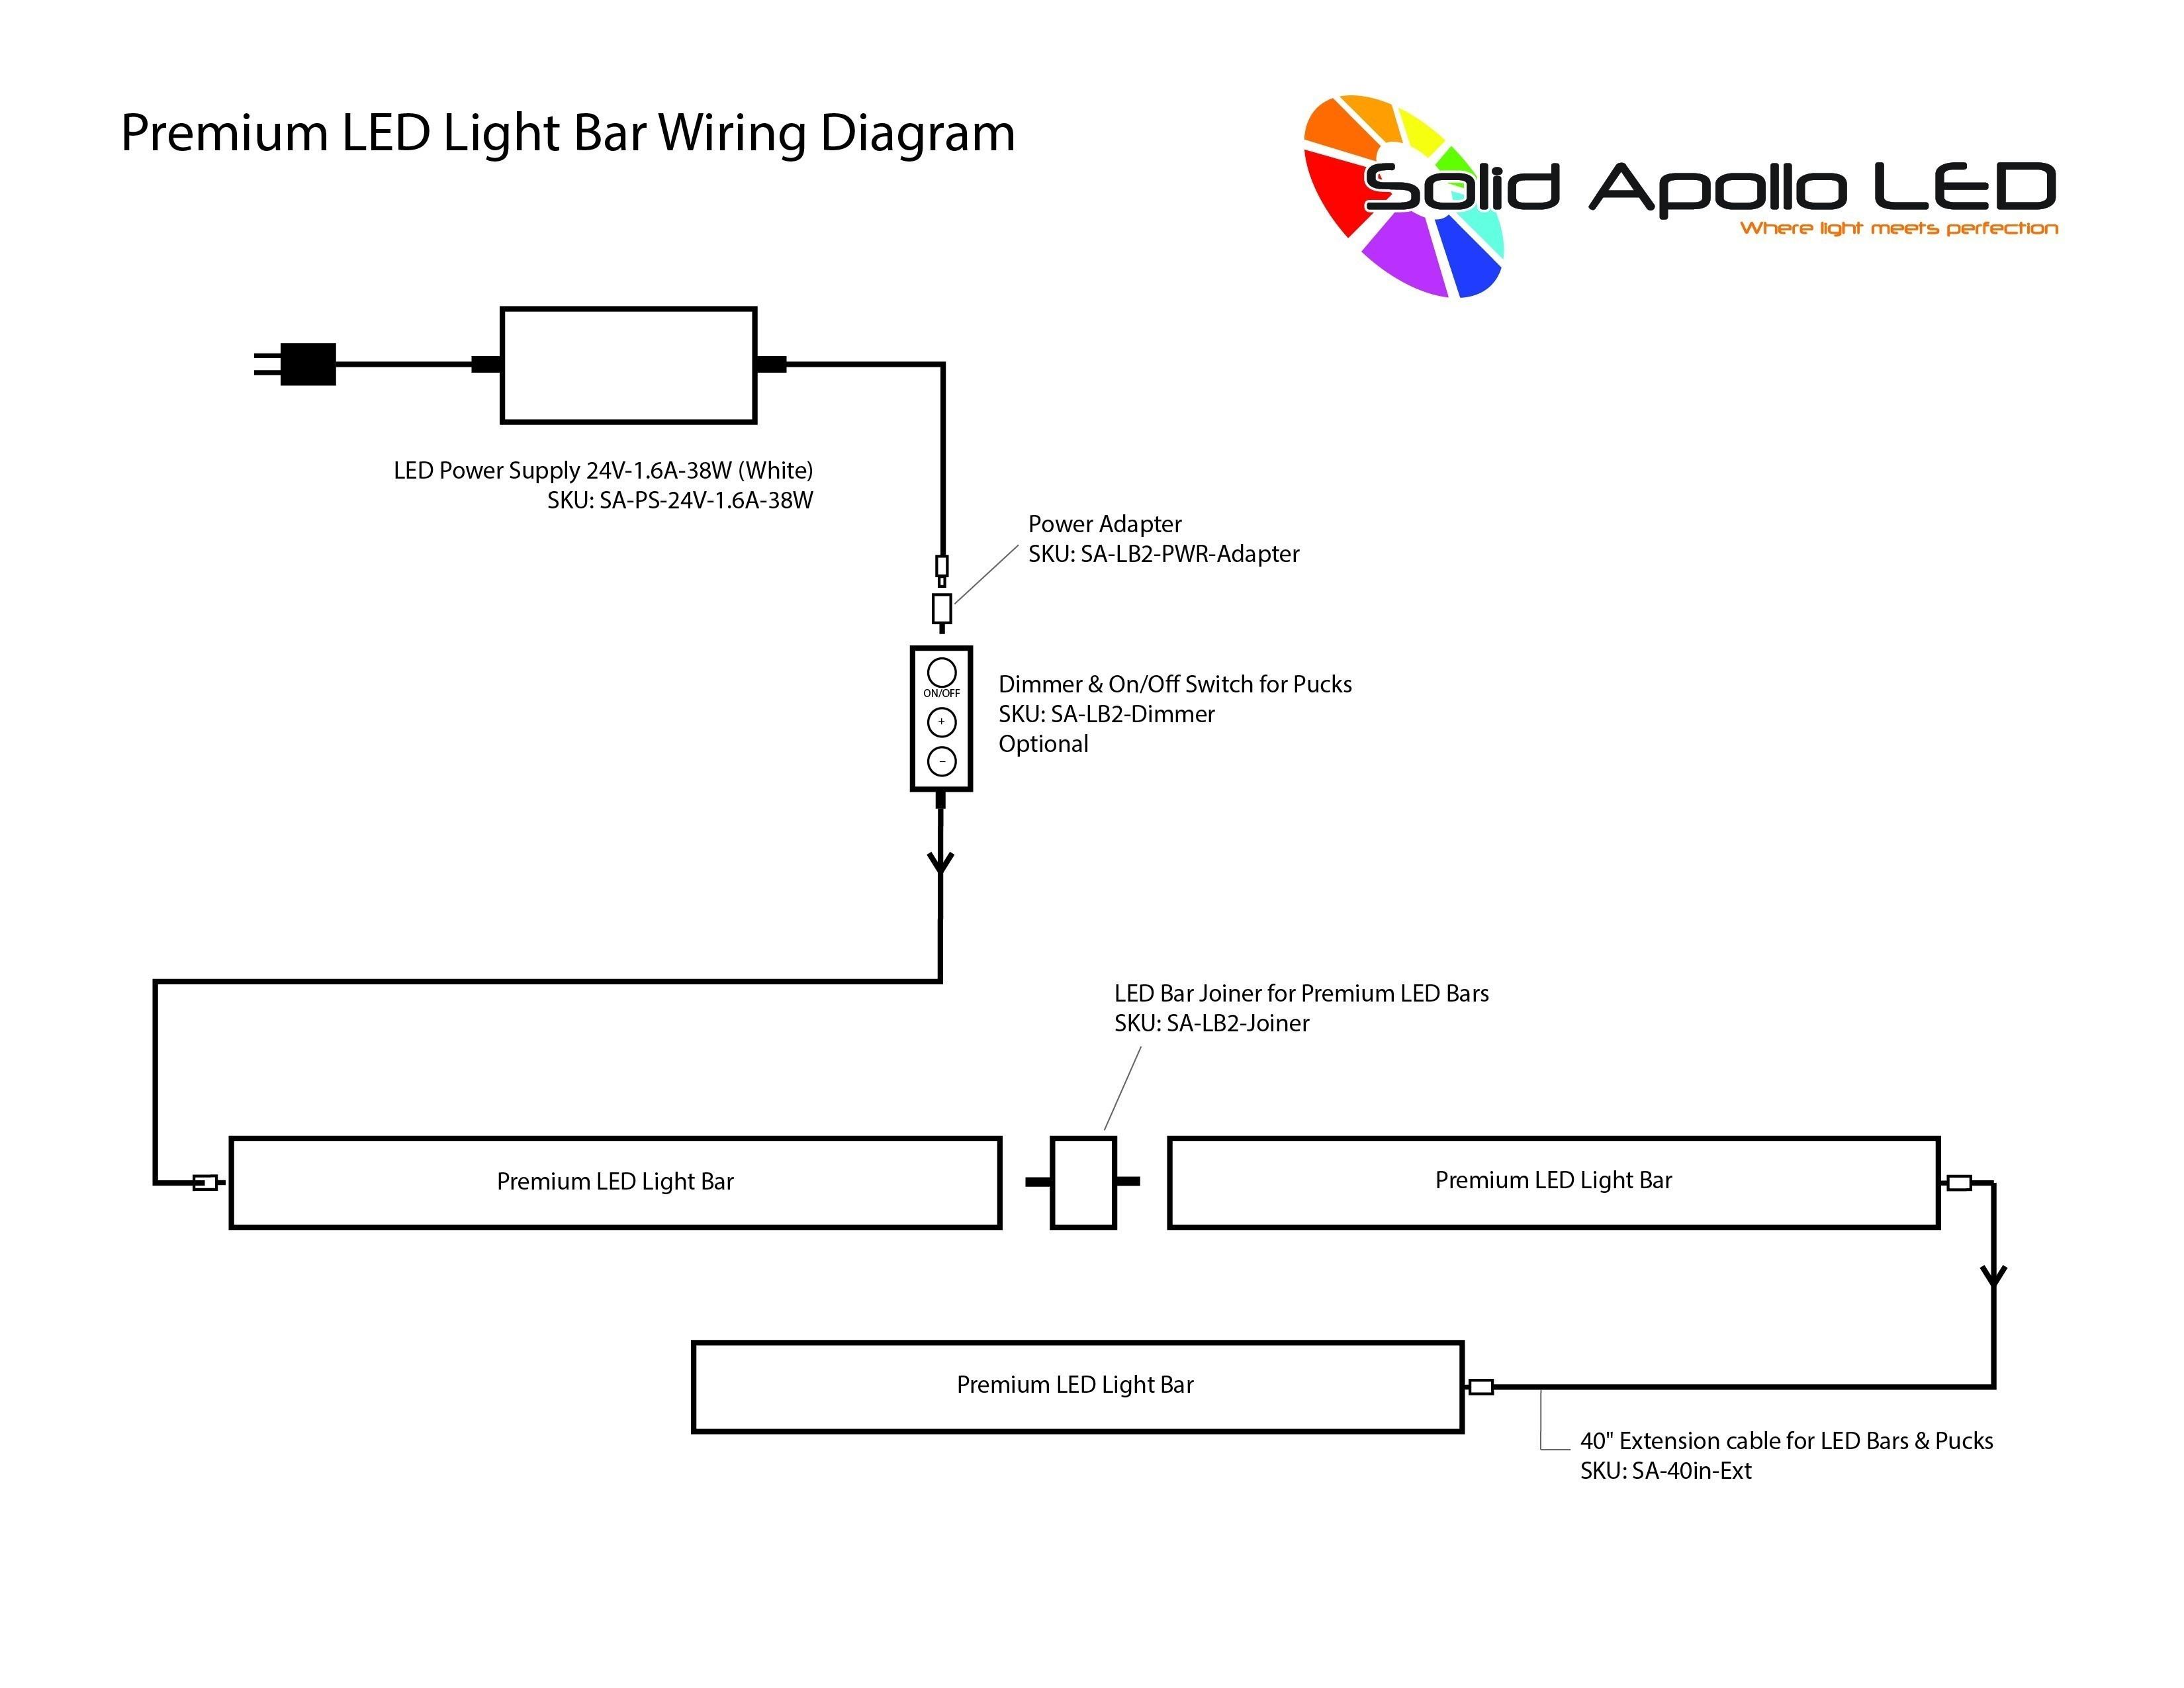 recon tailgate light bar wiring diagram Collection-Anzo Led Light Bar Wiring Diagram New Led Tailgate Light Bar Wiring Diagram Furthermore Led Light 3-e